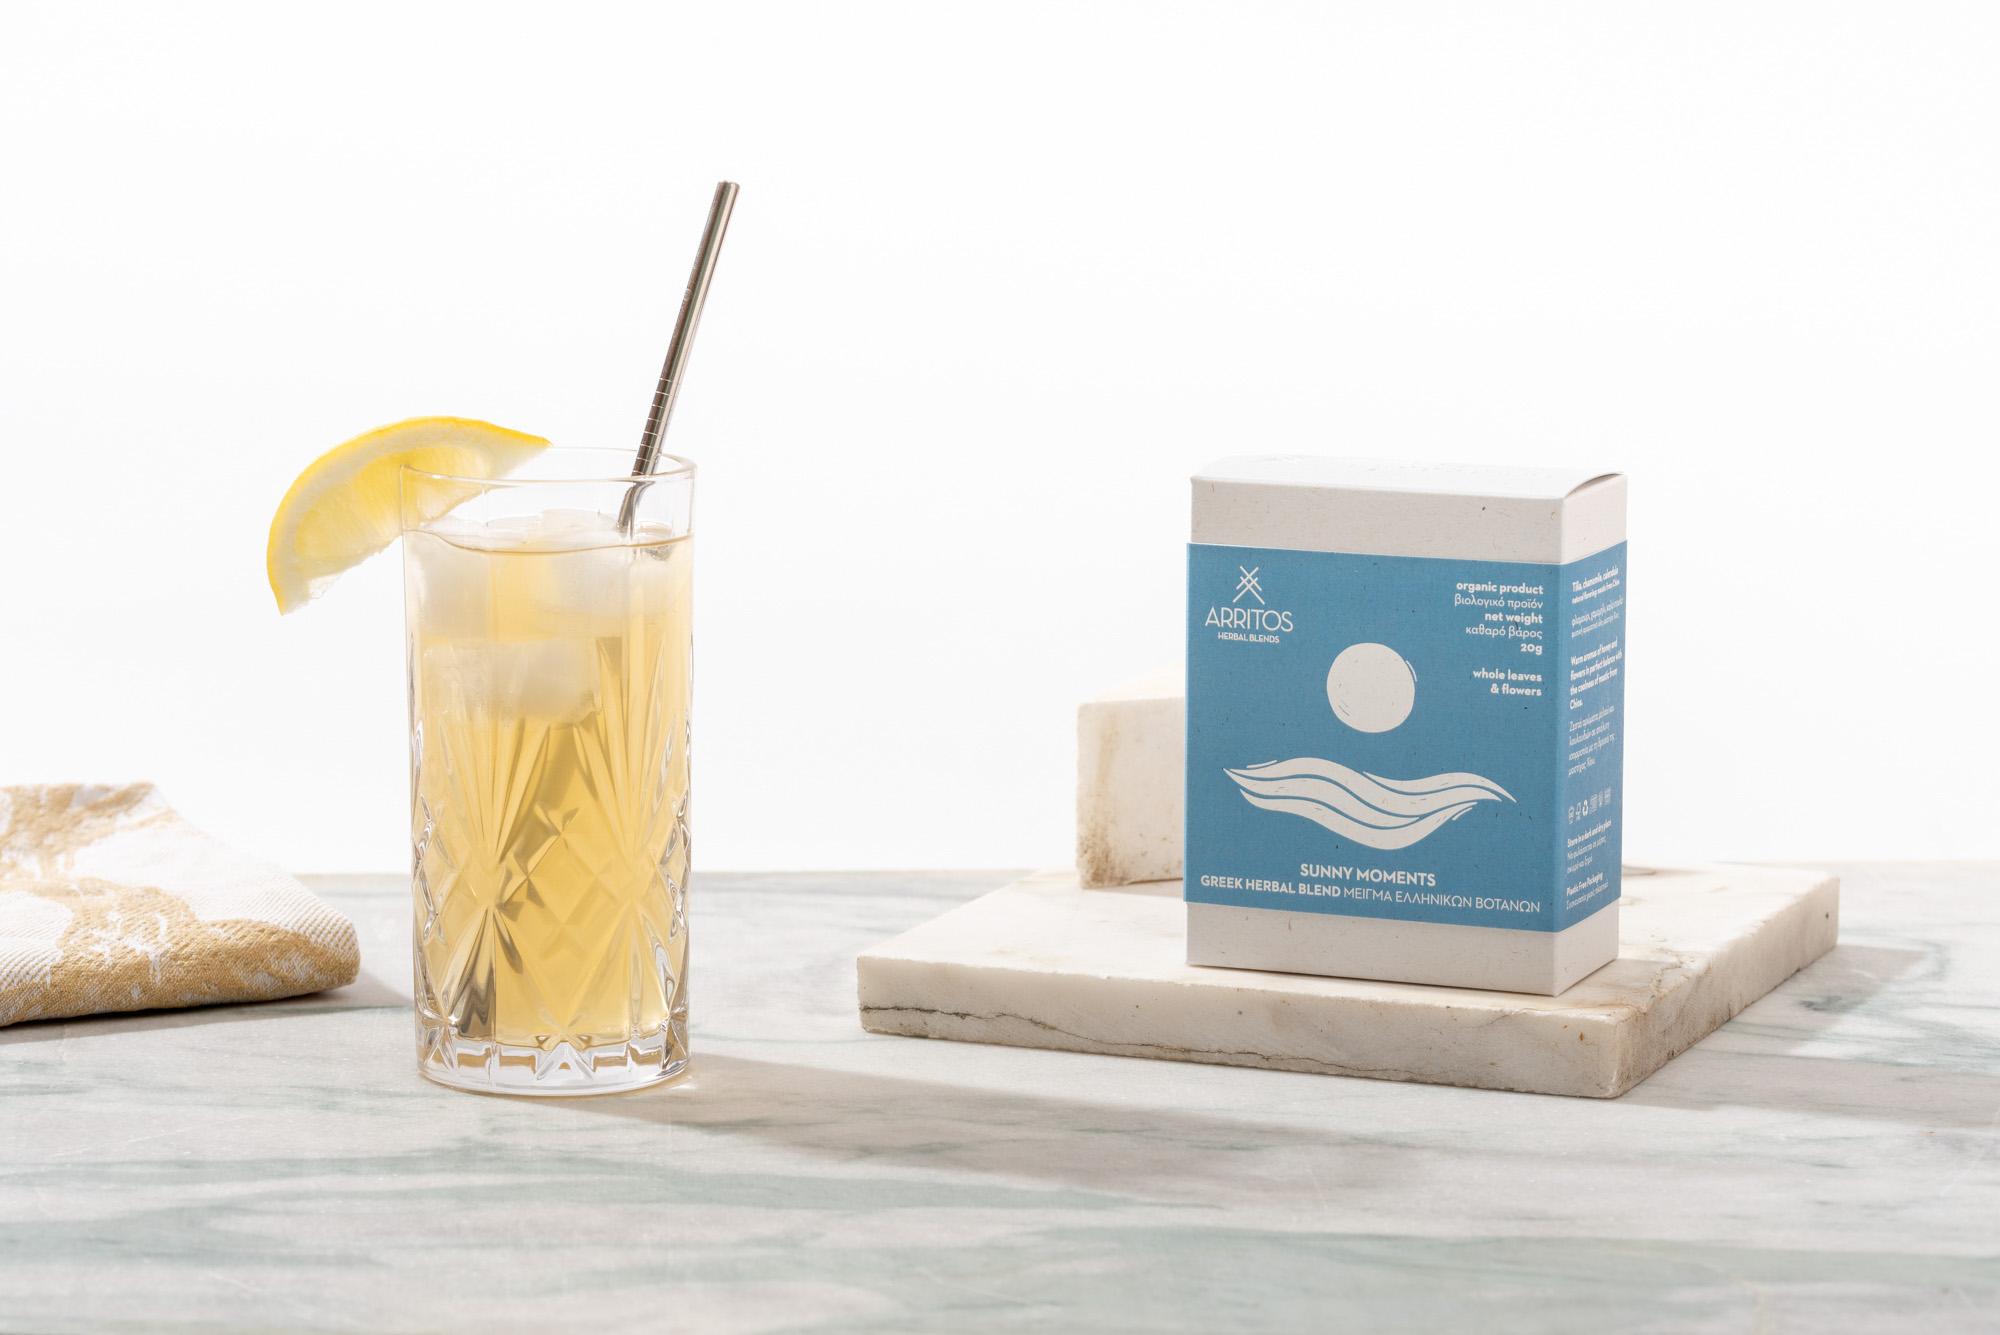 Slab Design Studio Create the Packaging Design for Arritos Herbal Blends from Greece